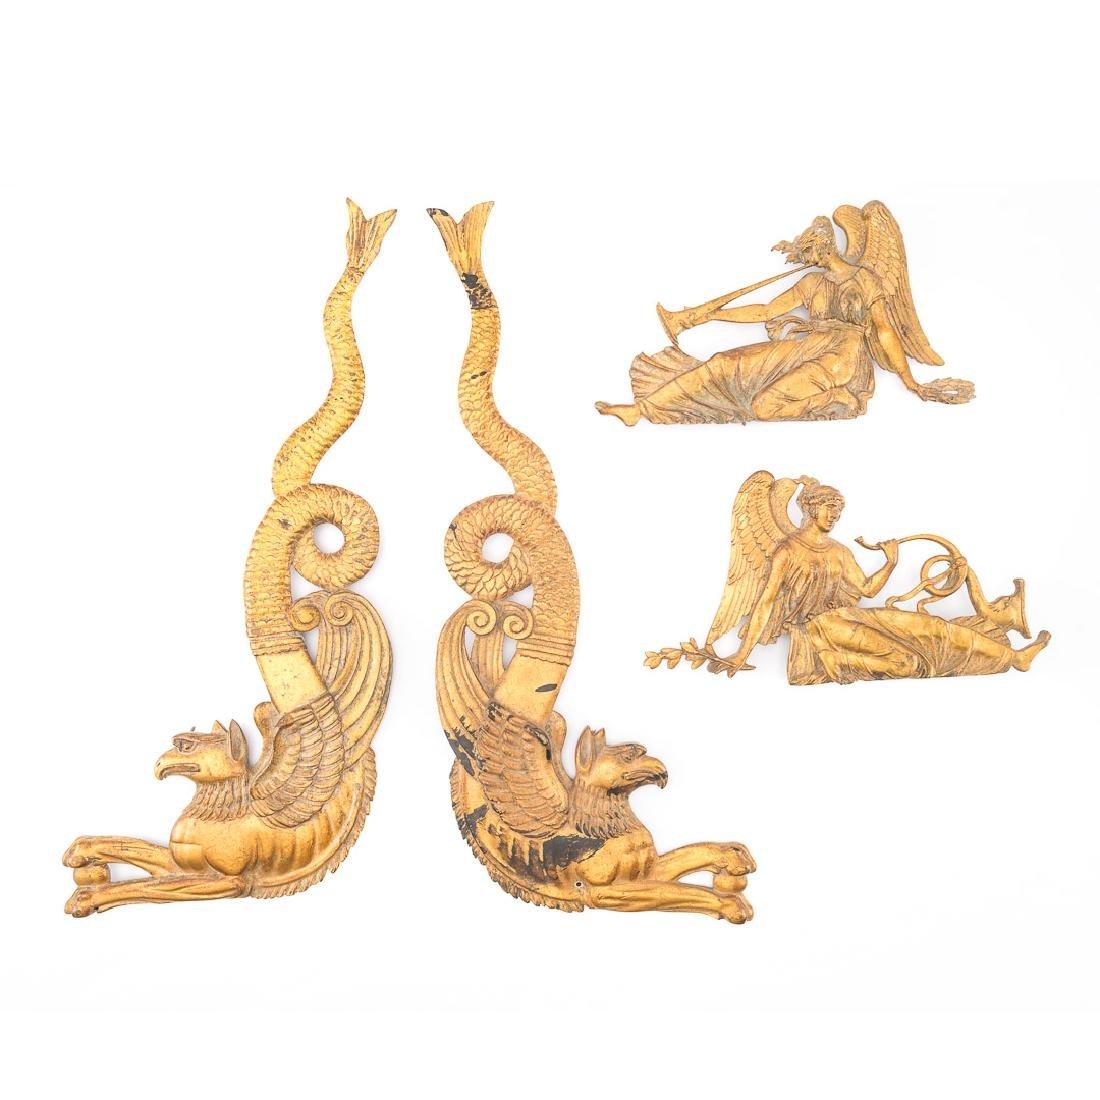 Four French Empire bronze dore mounts